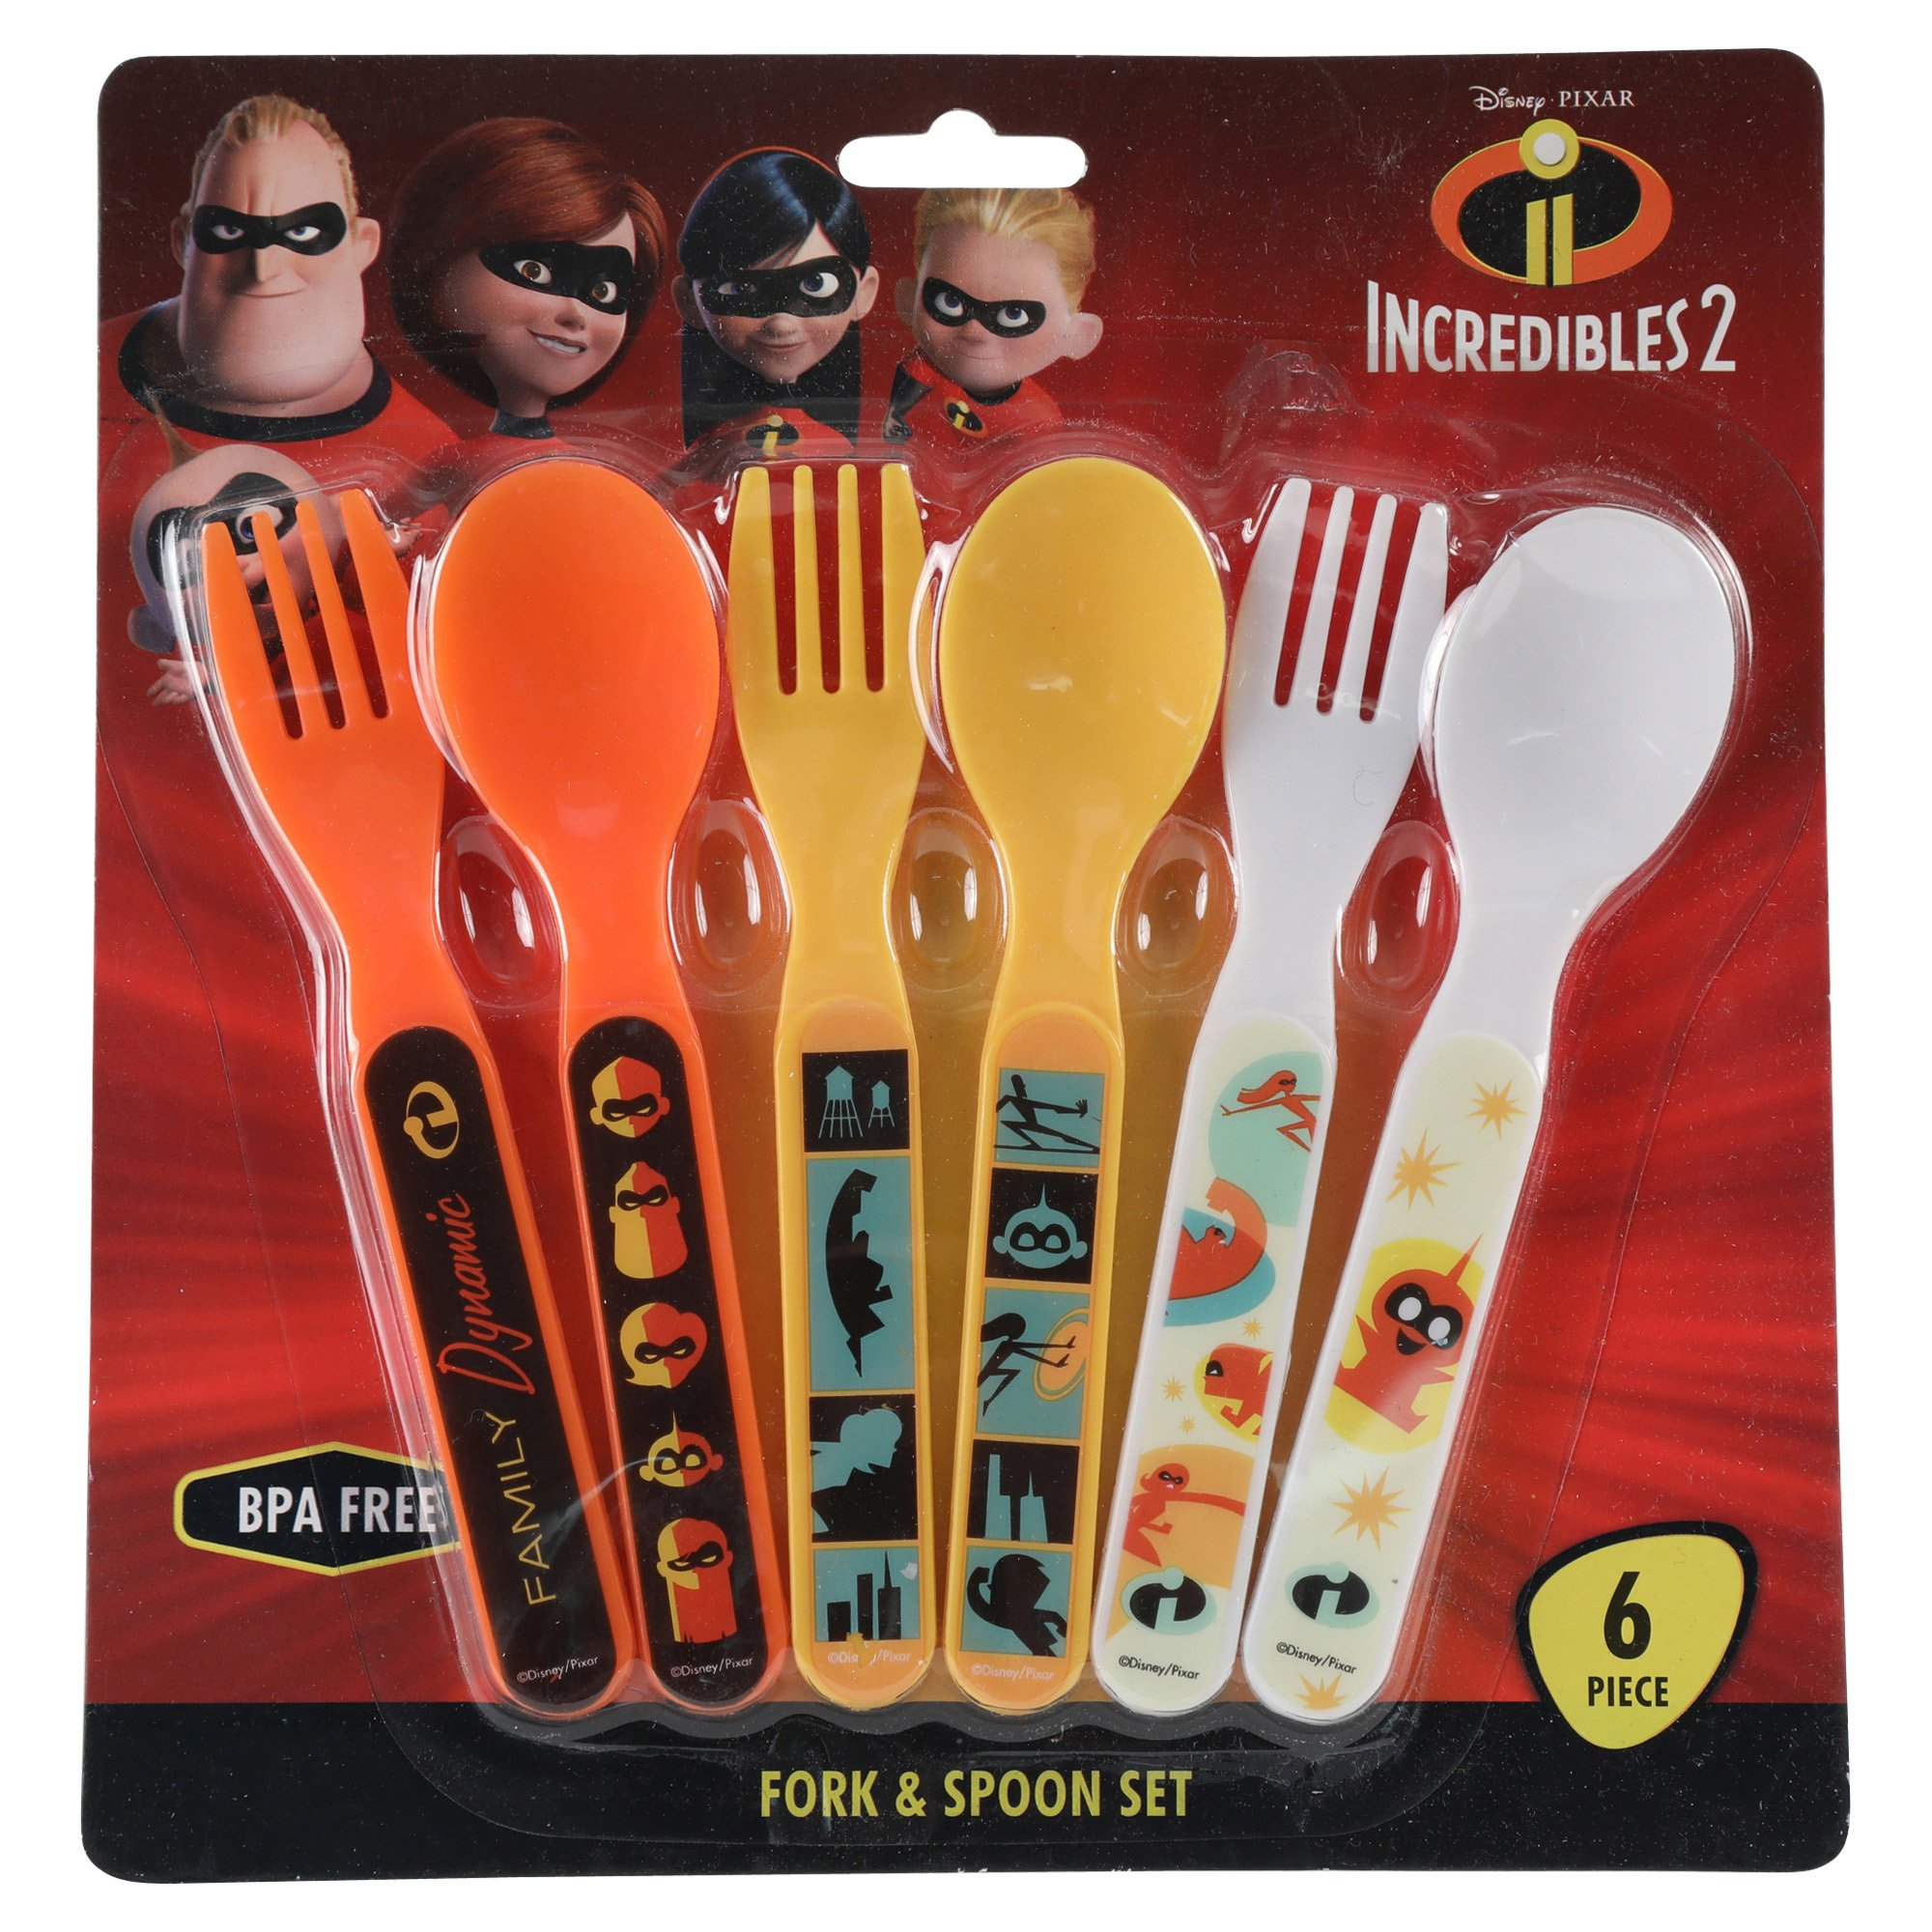 Disney•Pixar Incredibles 2 Fork and Spoon Set, Multi, 6 Count